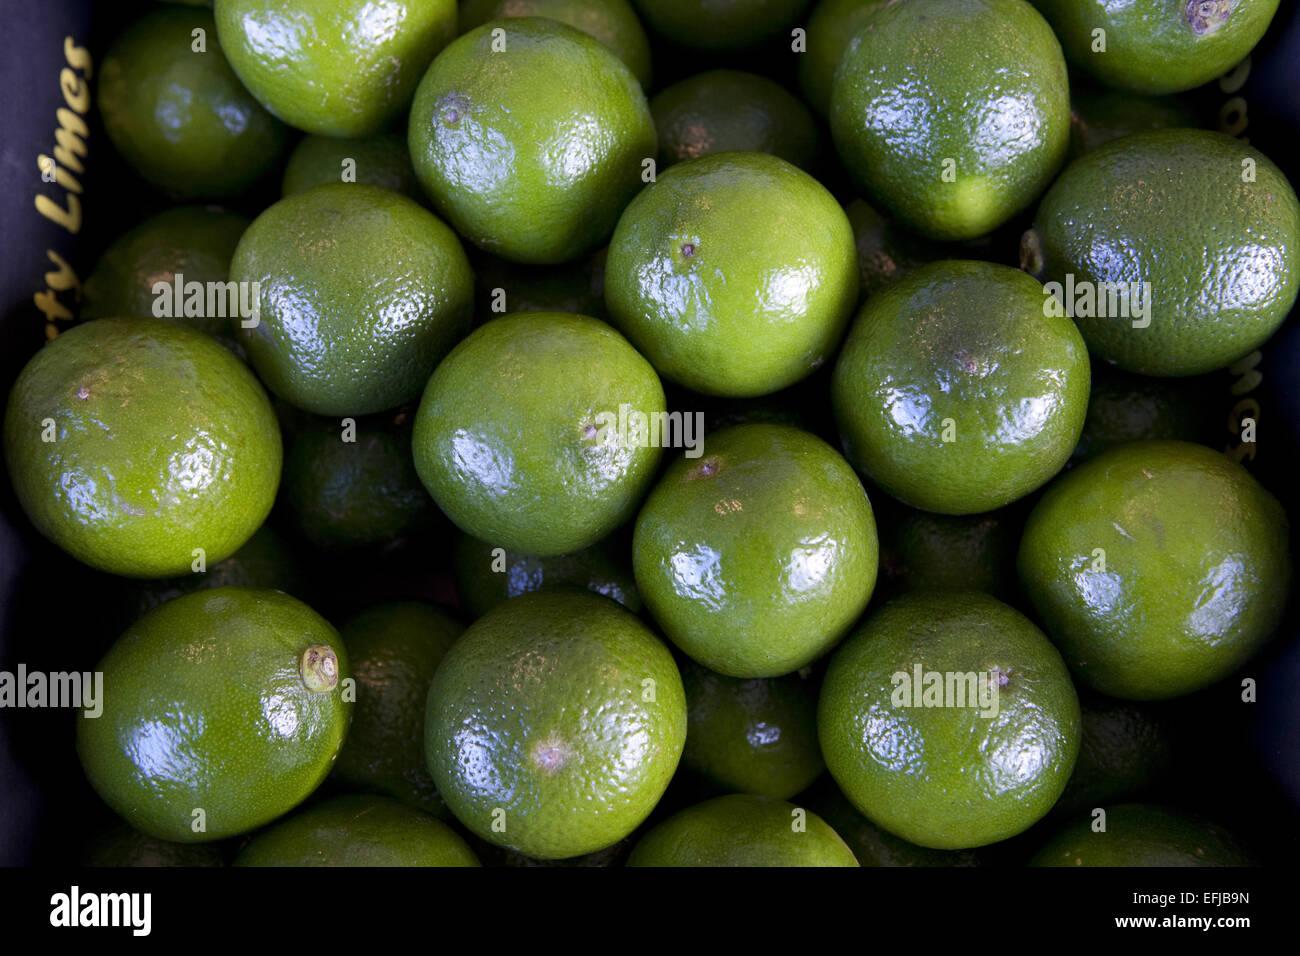 Fresh limes on market stall - Stock Image